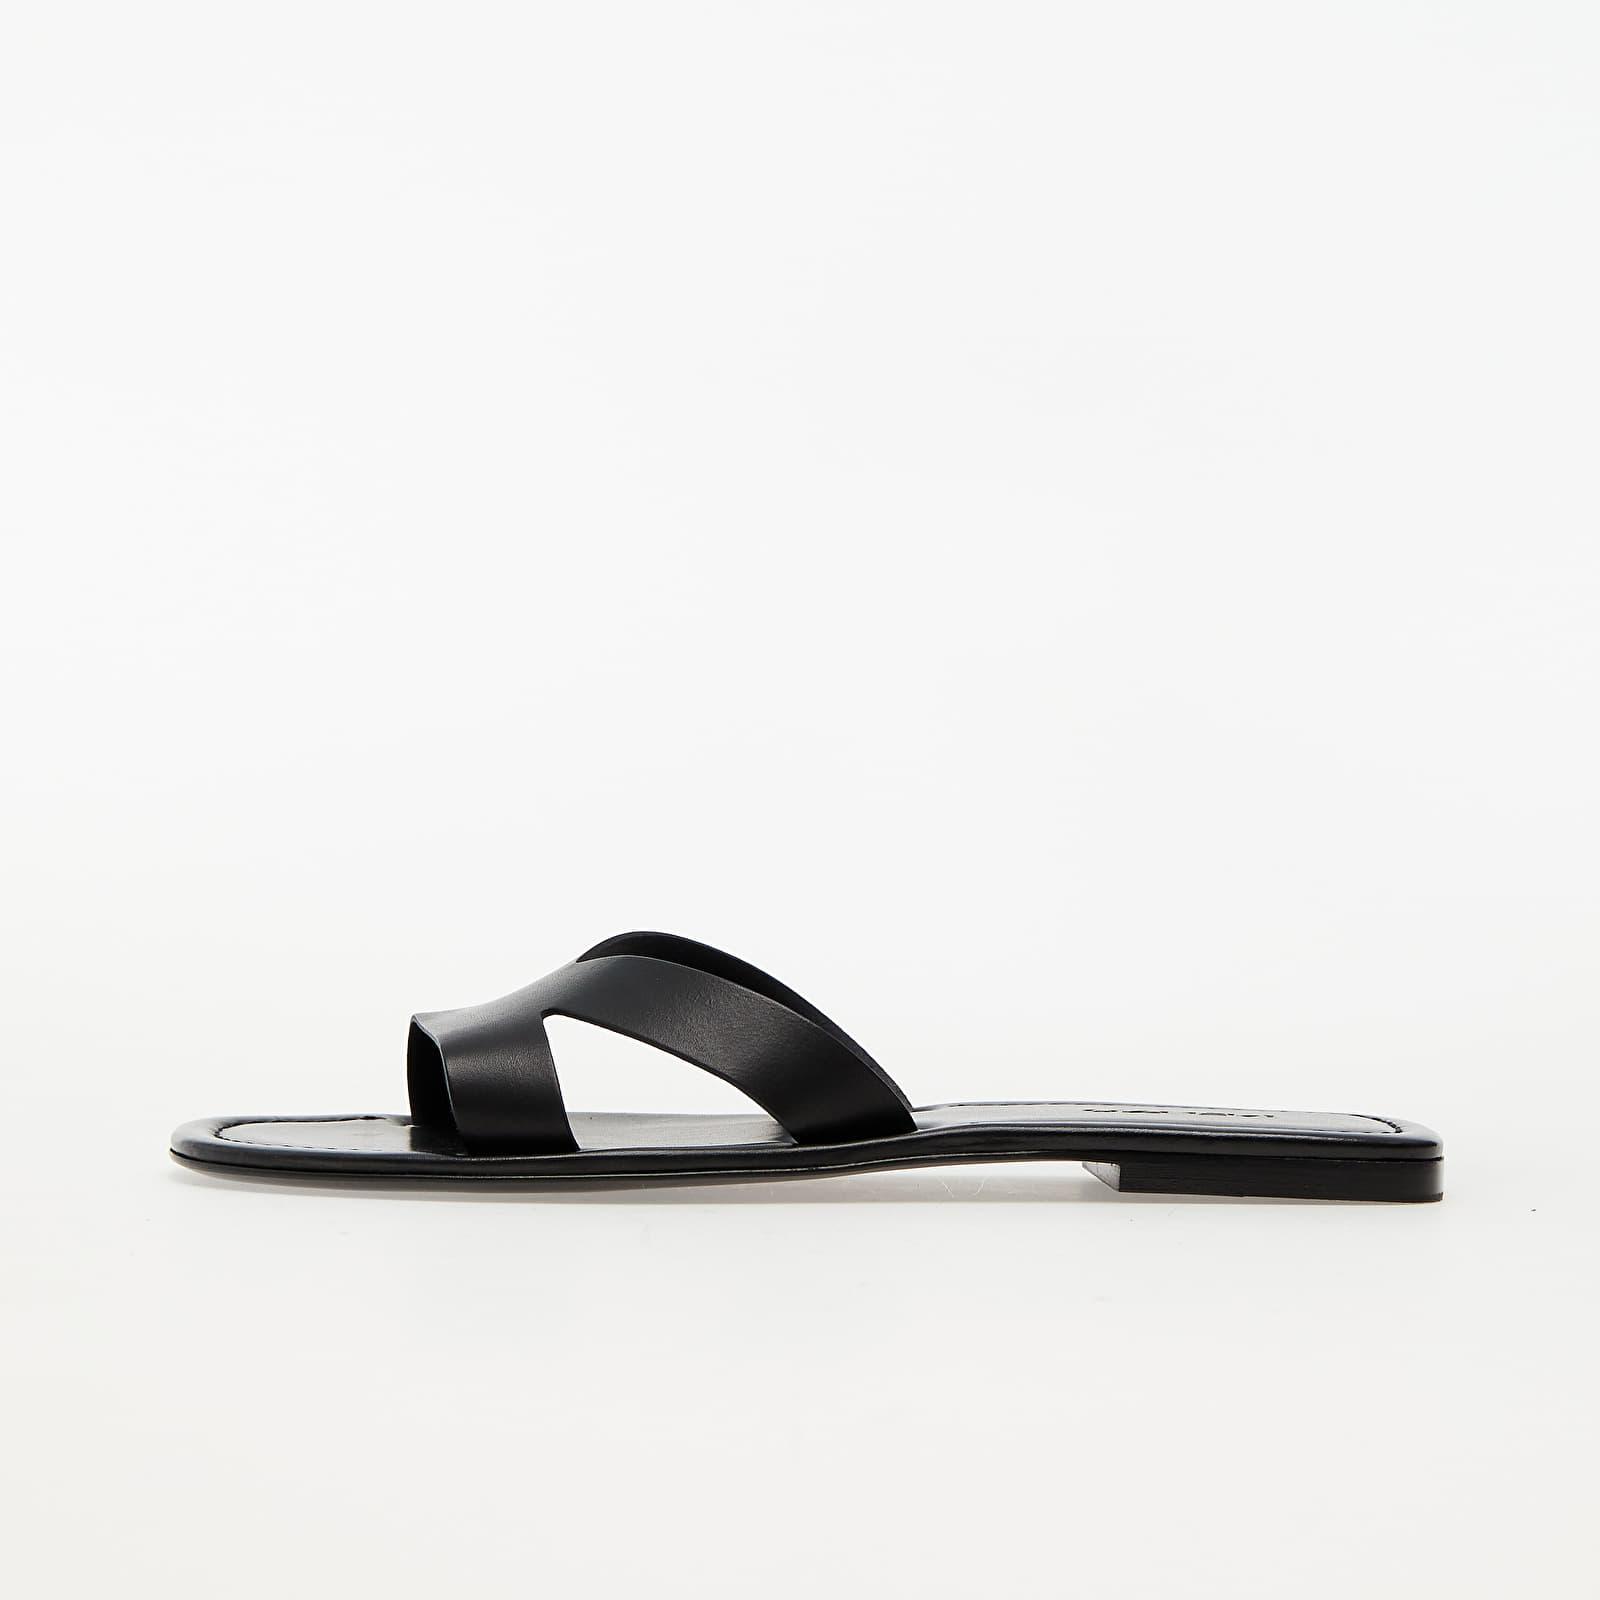 Kenzo Sandal Black FB52MU021L65.99